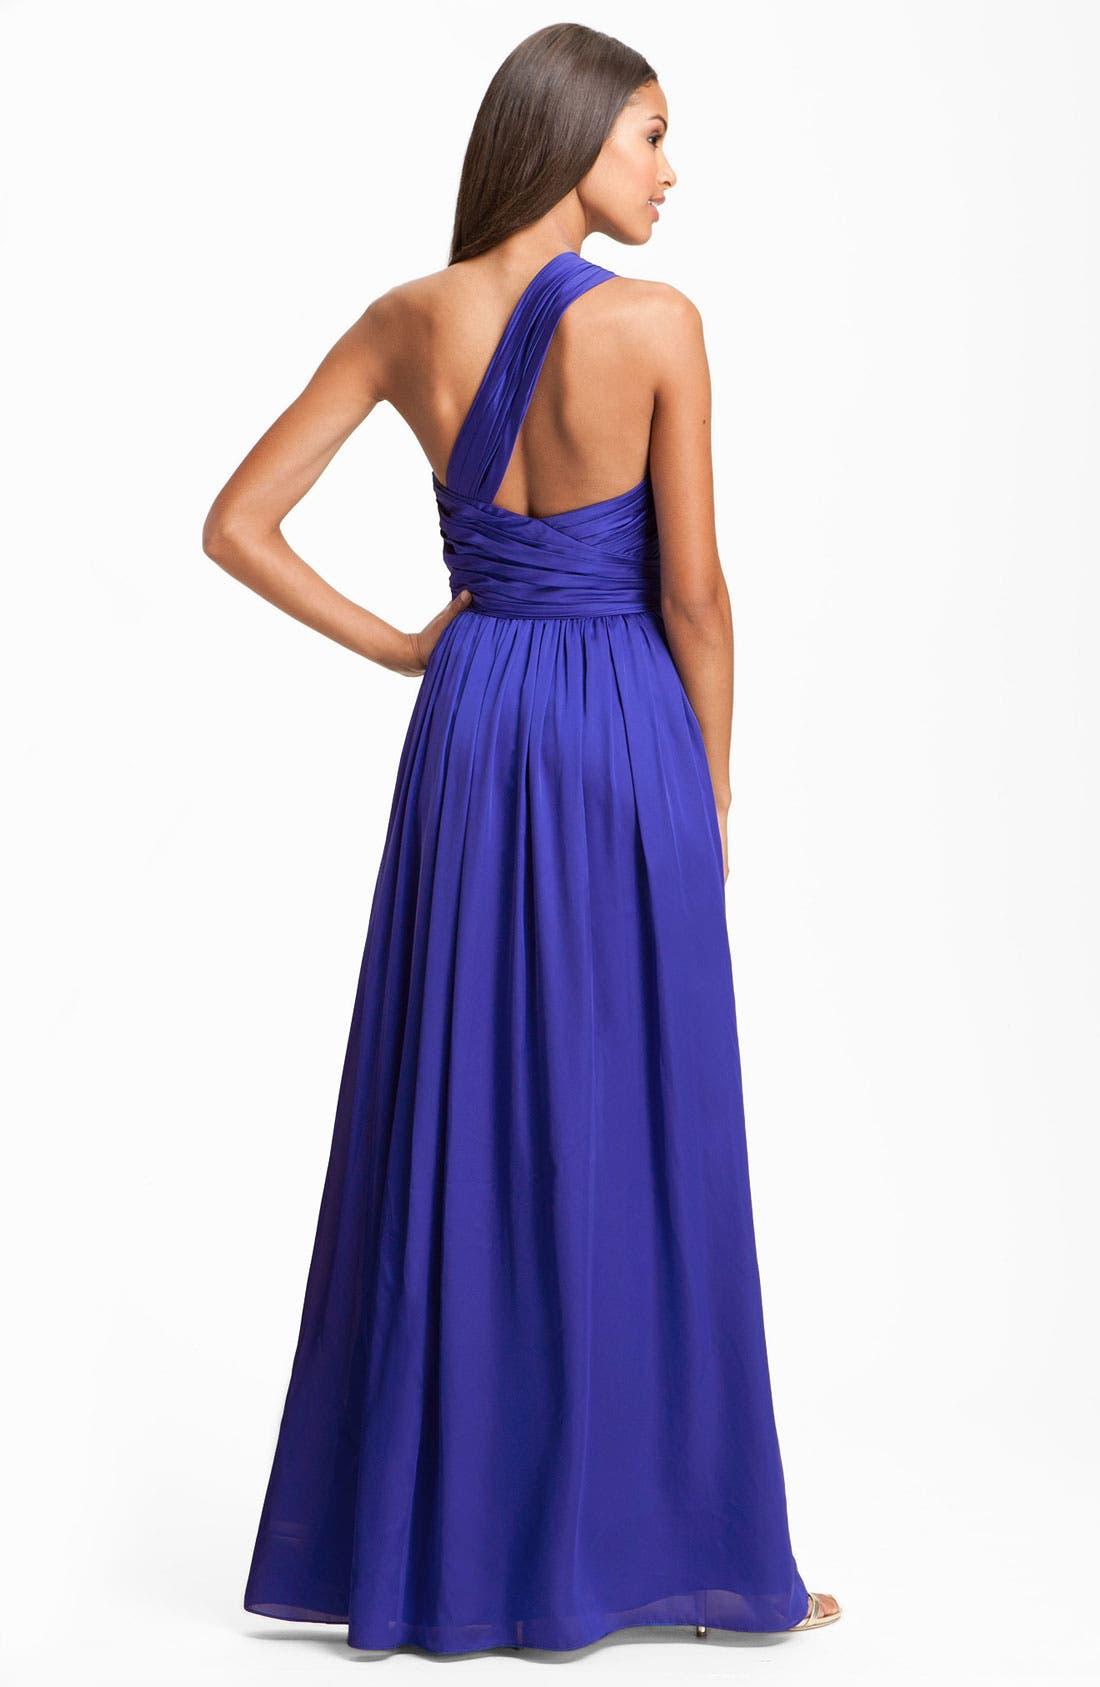 Alternate Image 2  - ML Monique Lhuillier Bridesmaids One Shoulder Charmeuse Gown (Nordstrom Exclusive)